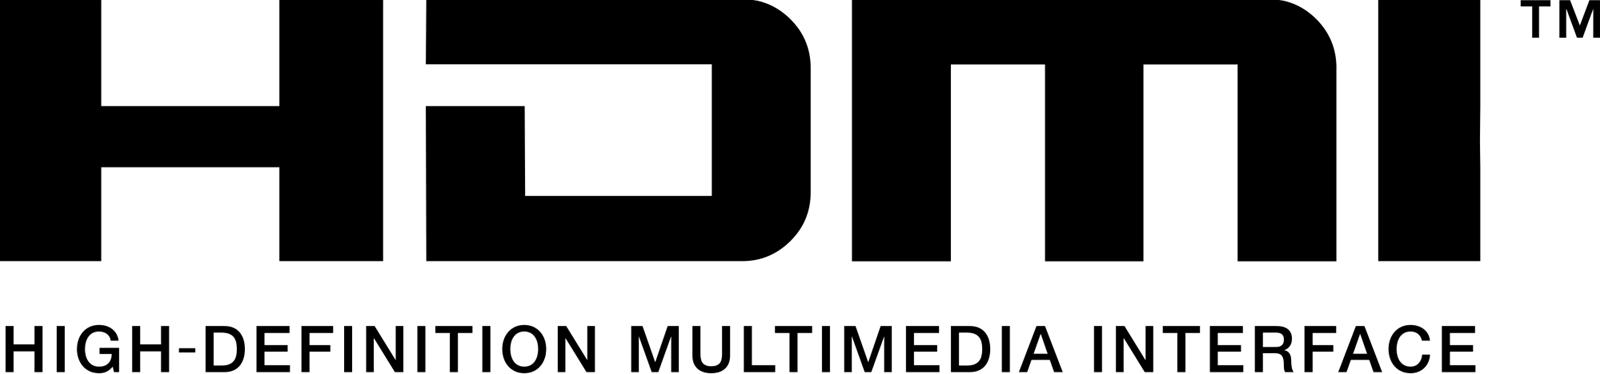 hdmi va displayport la gi: hdmi logo